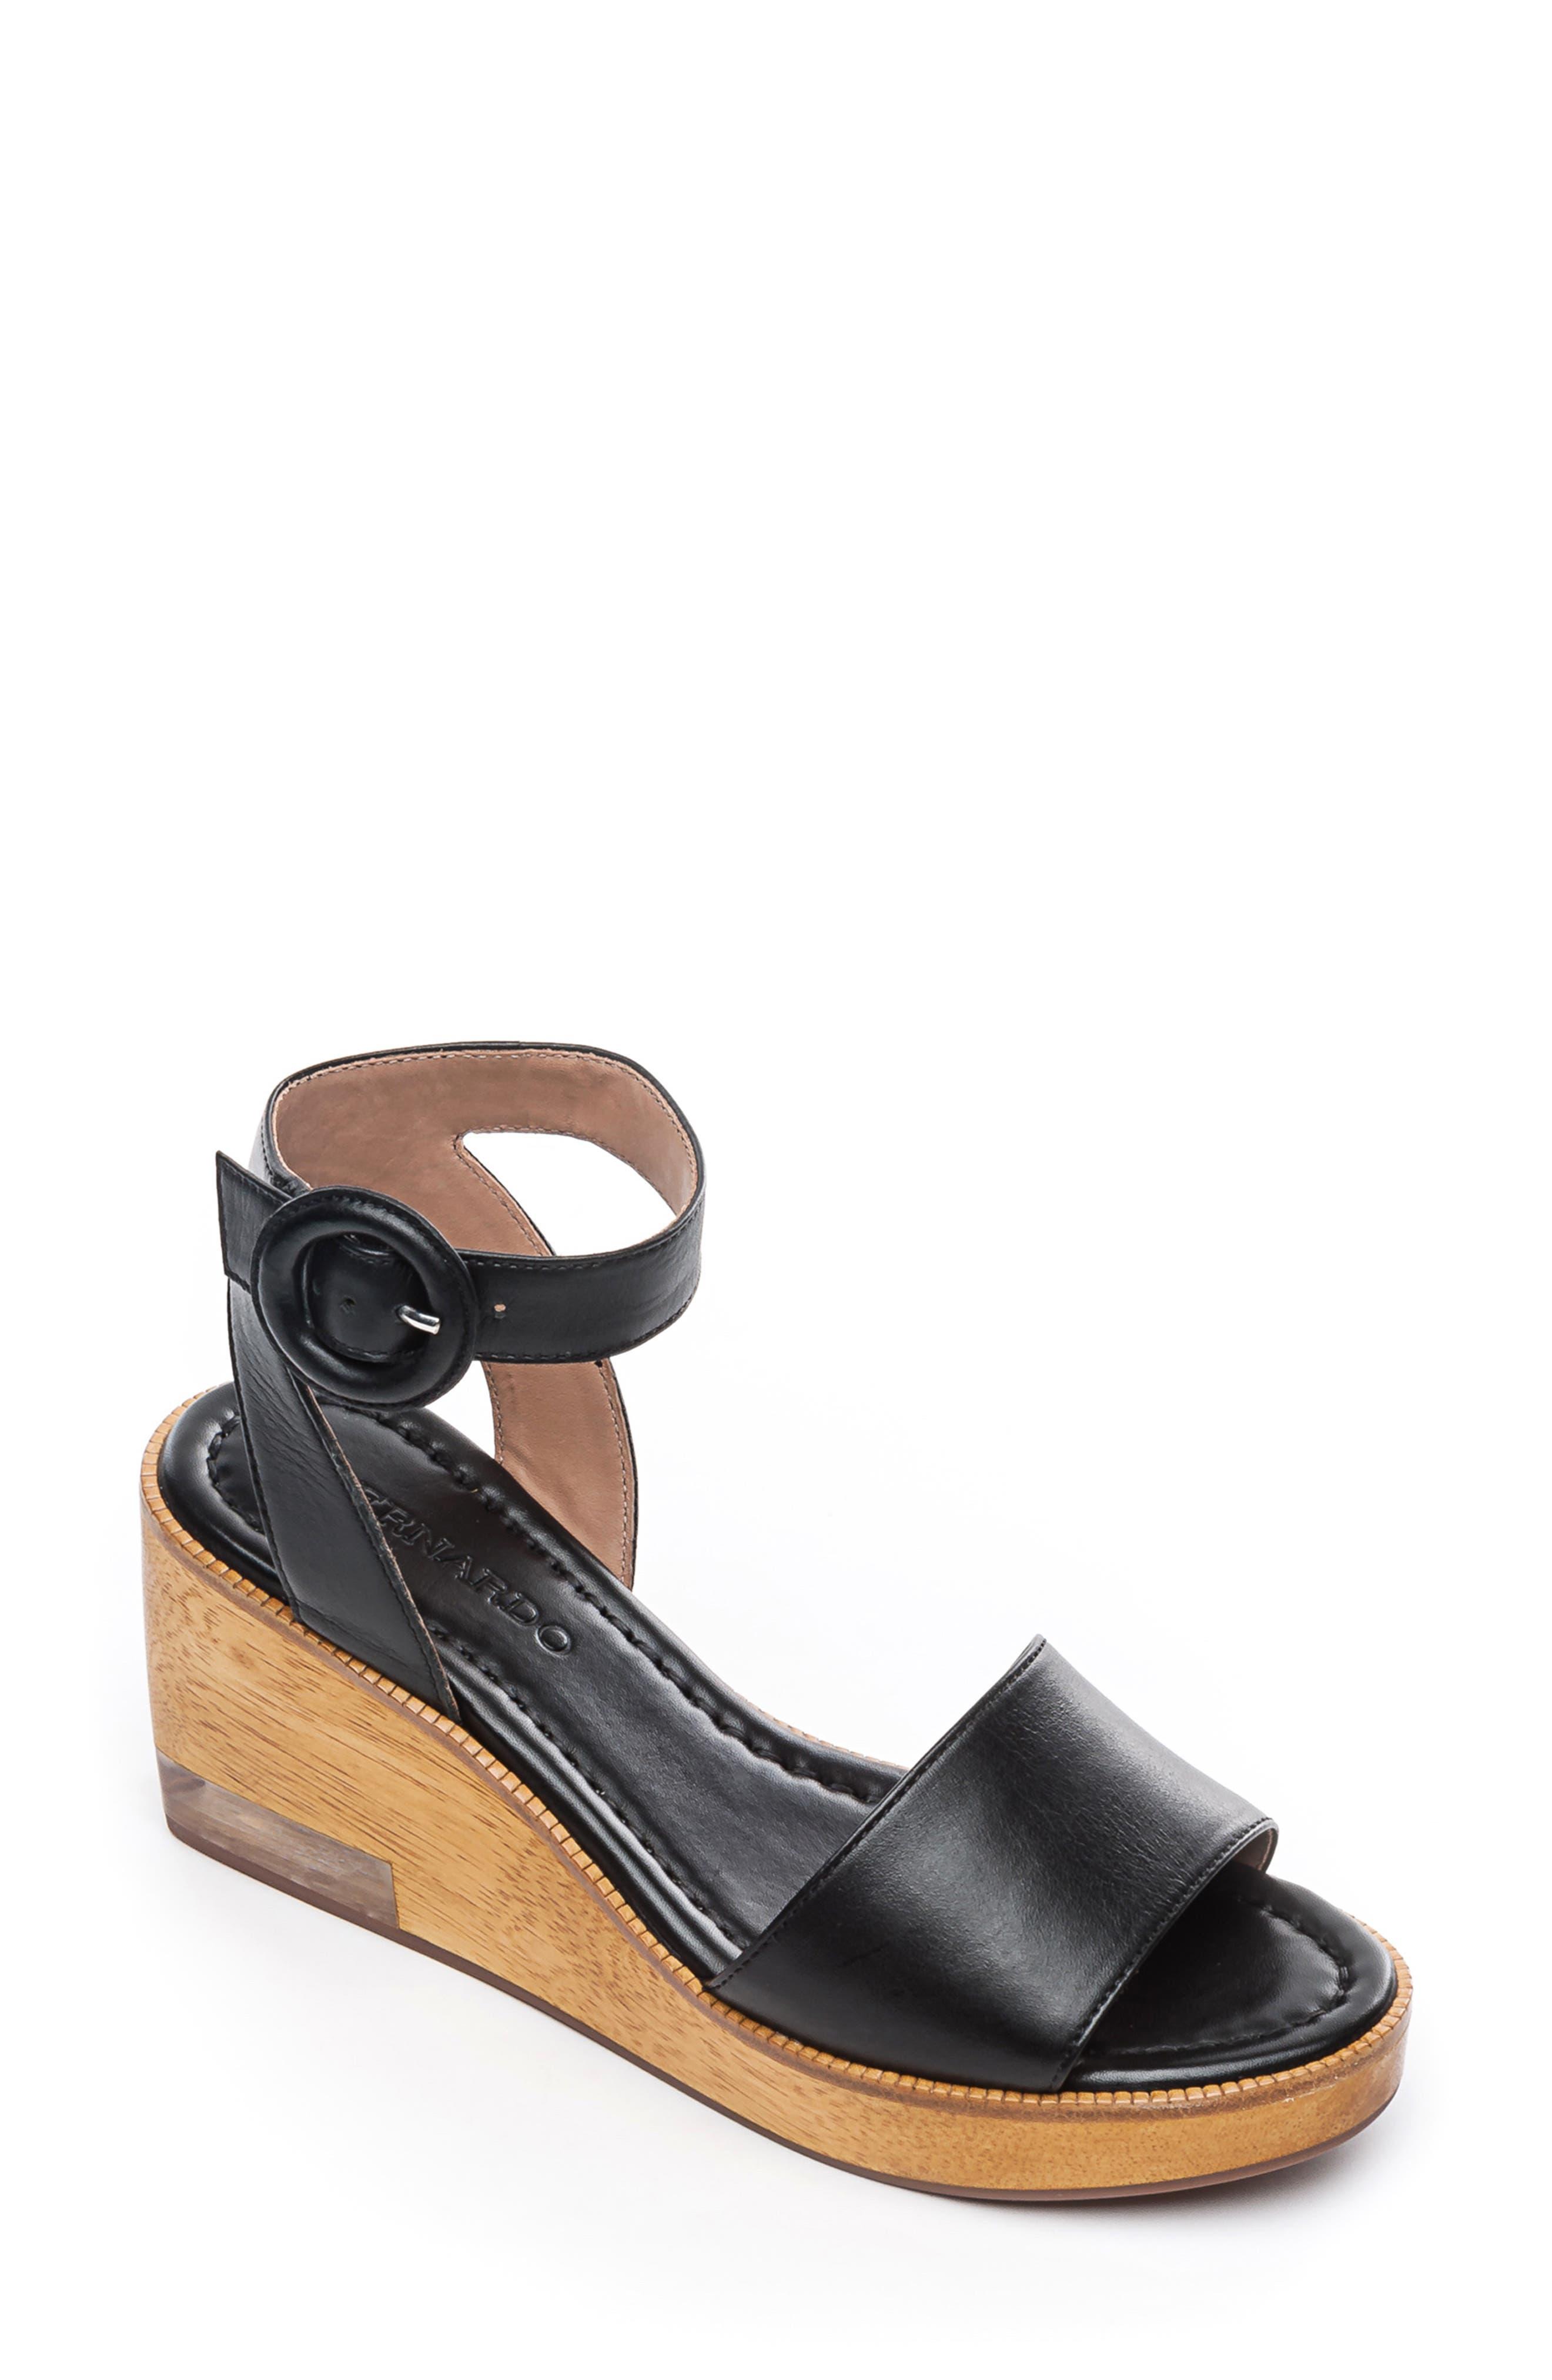 Bernardo Kate Platform Wedge Sandal, Black